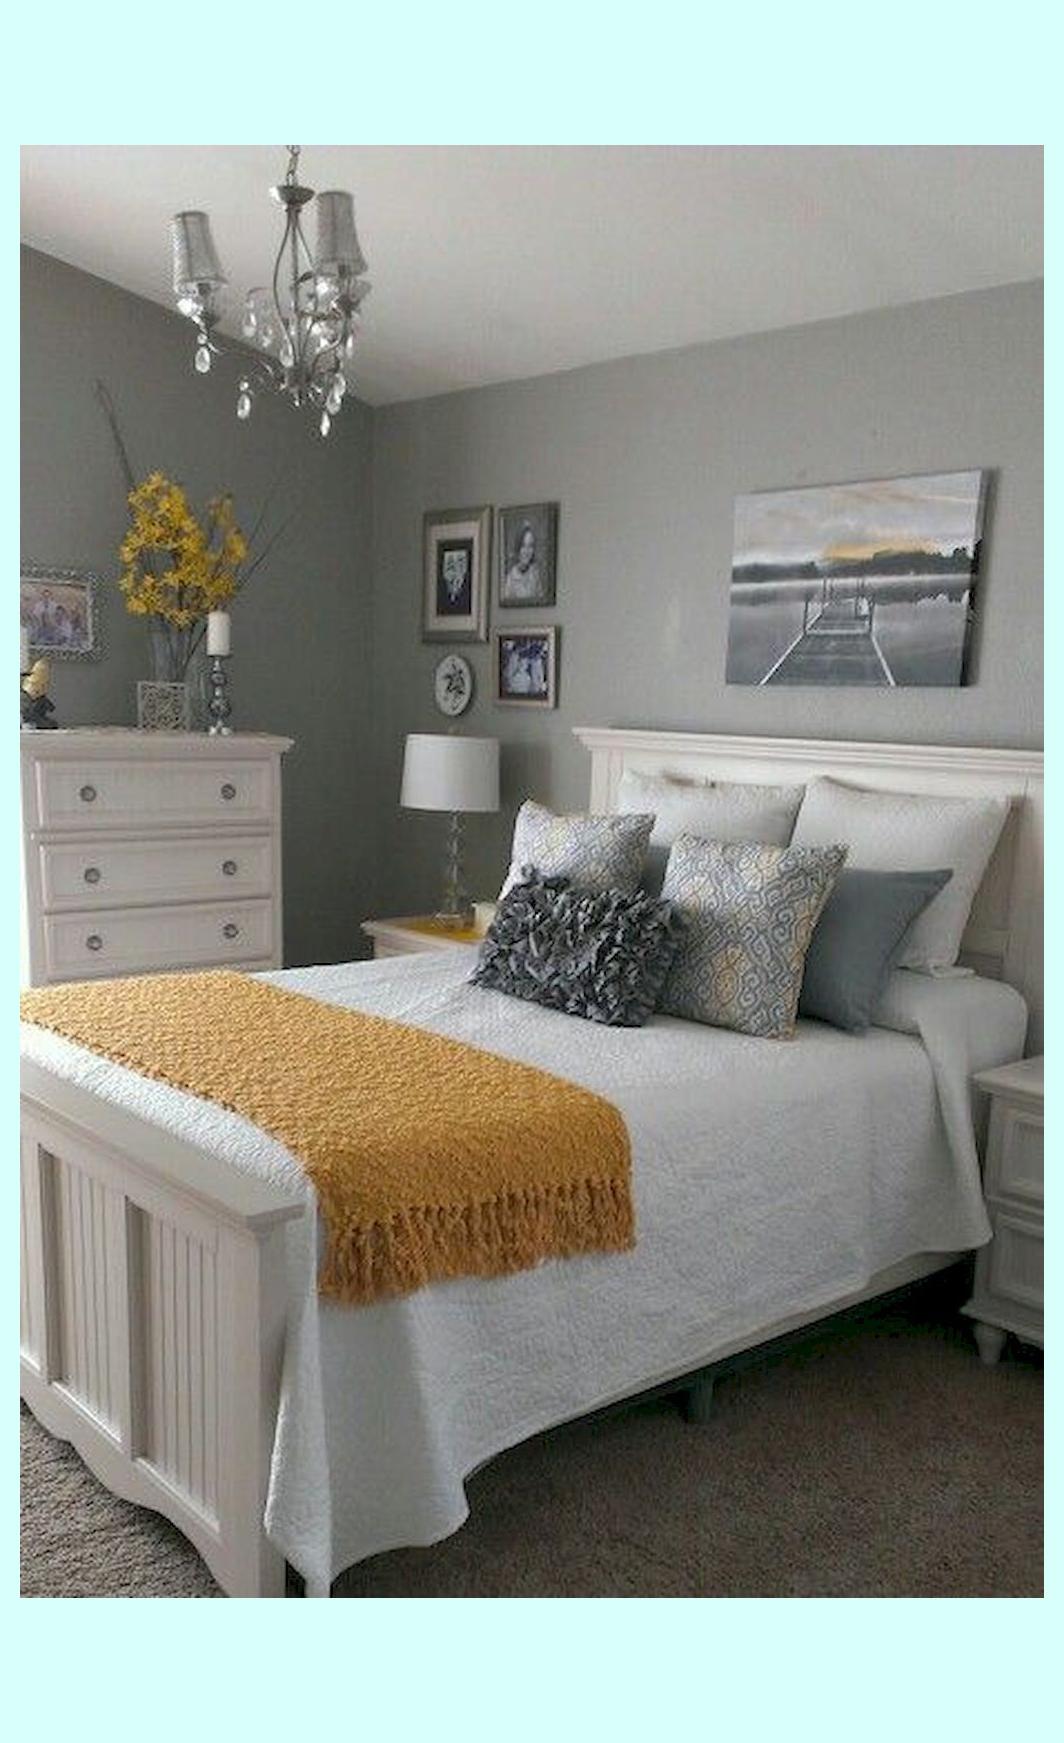 70 Bright Yellow Bedroom Decor Ideas Bedroomdecor Yellow